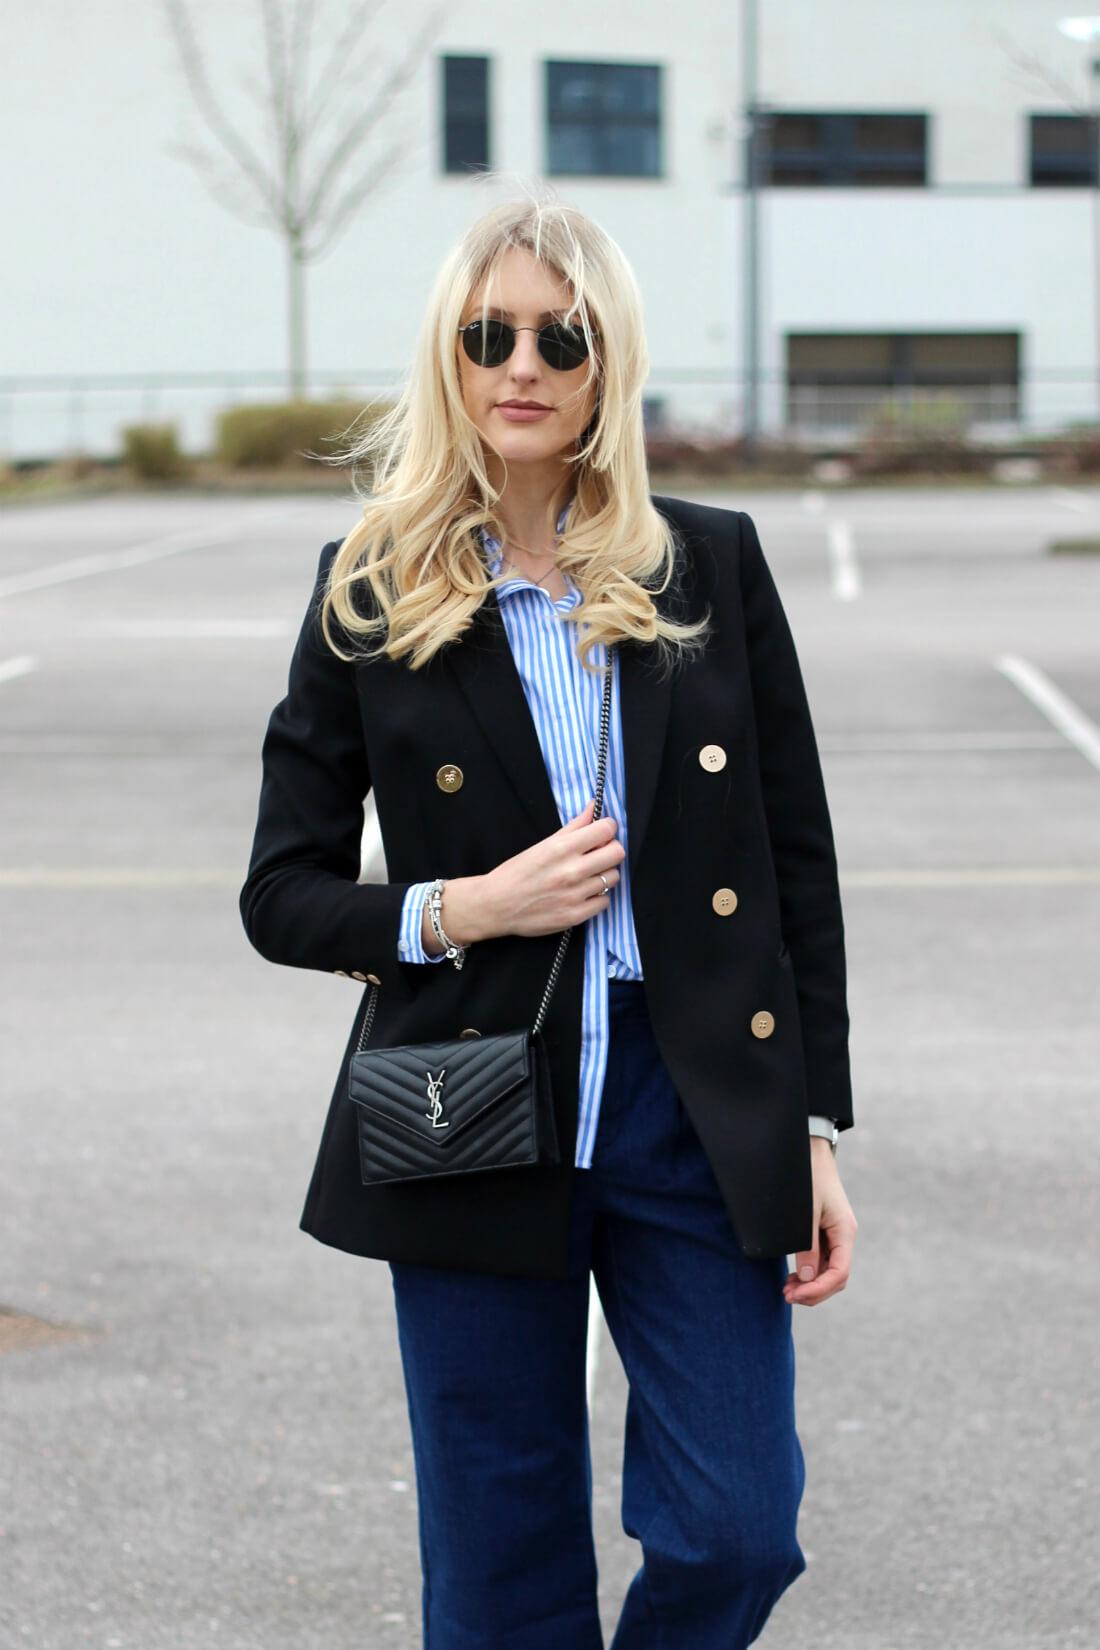 style blogger charlotte lewis in reiss blazer